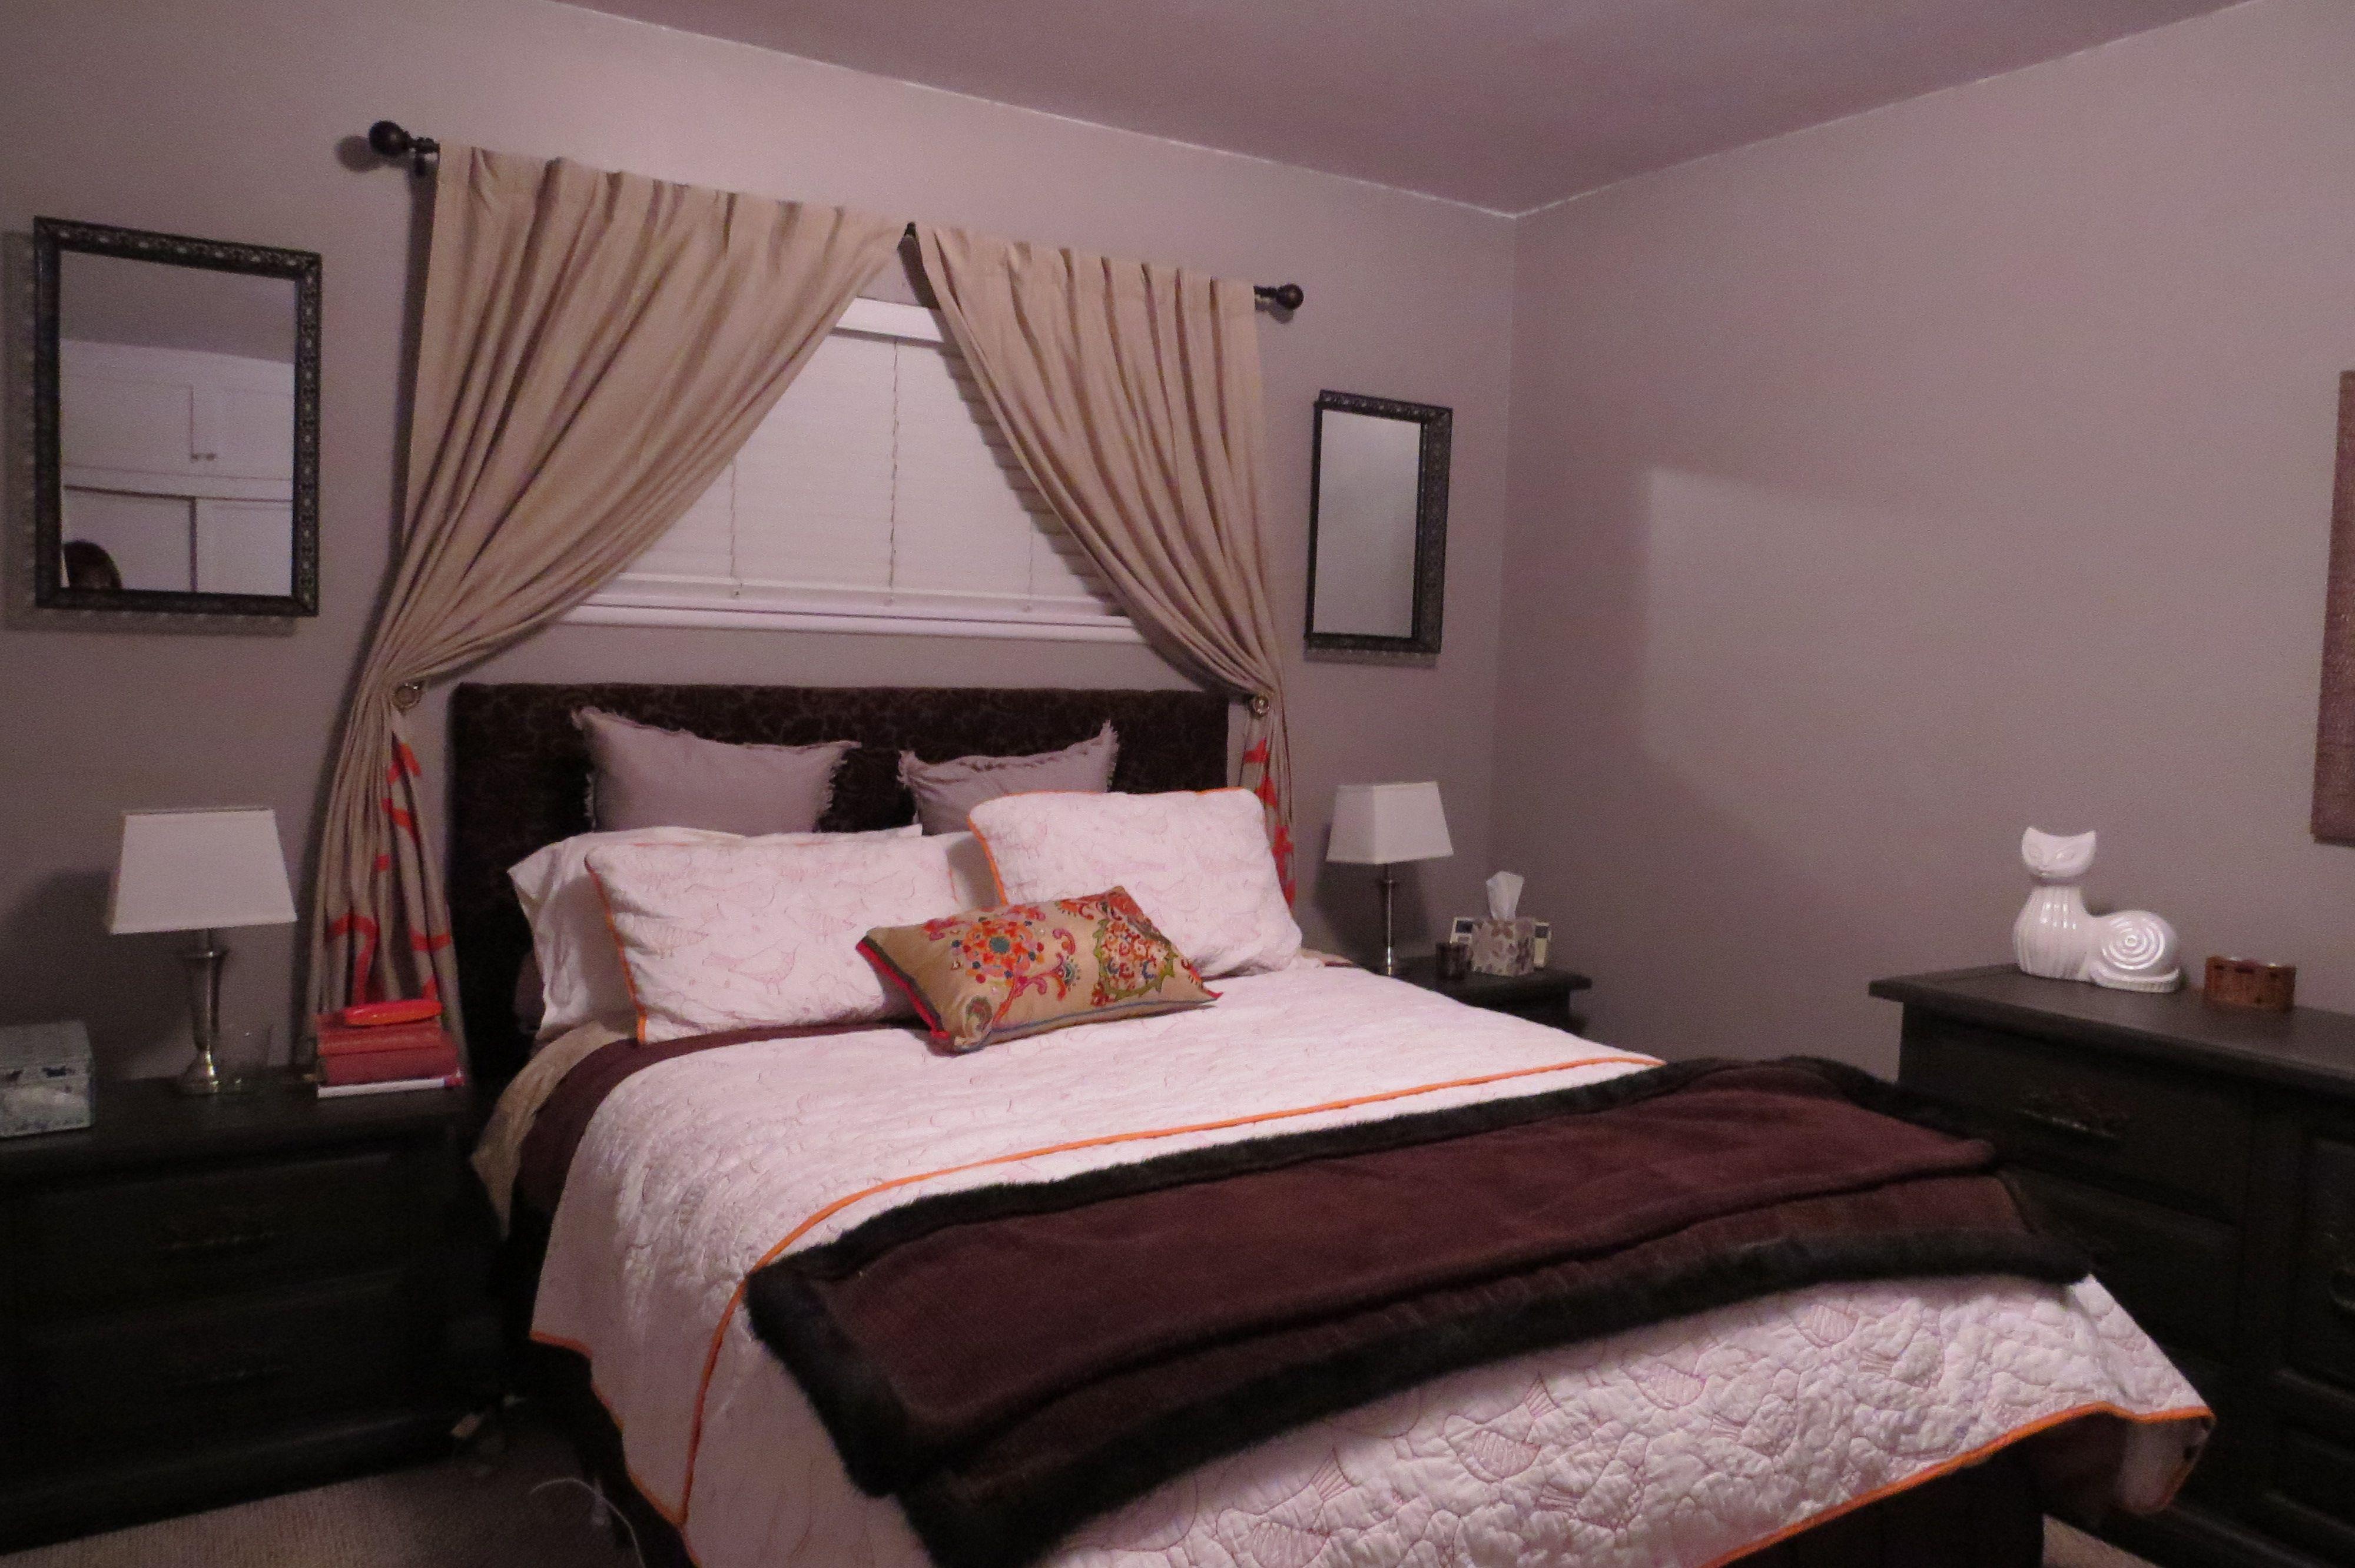 Valspar Bedroom Color Ideas Part - 29: DIY Bedroom Painted In Valspar London Coach With My Favorite Accent Color-orange.  No